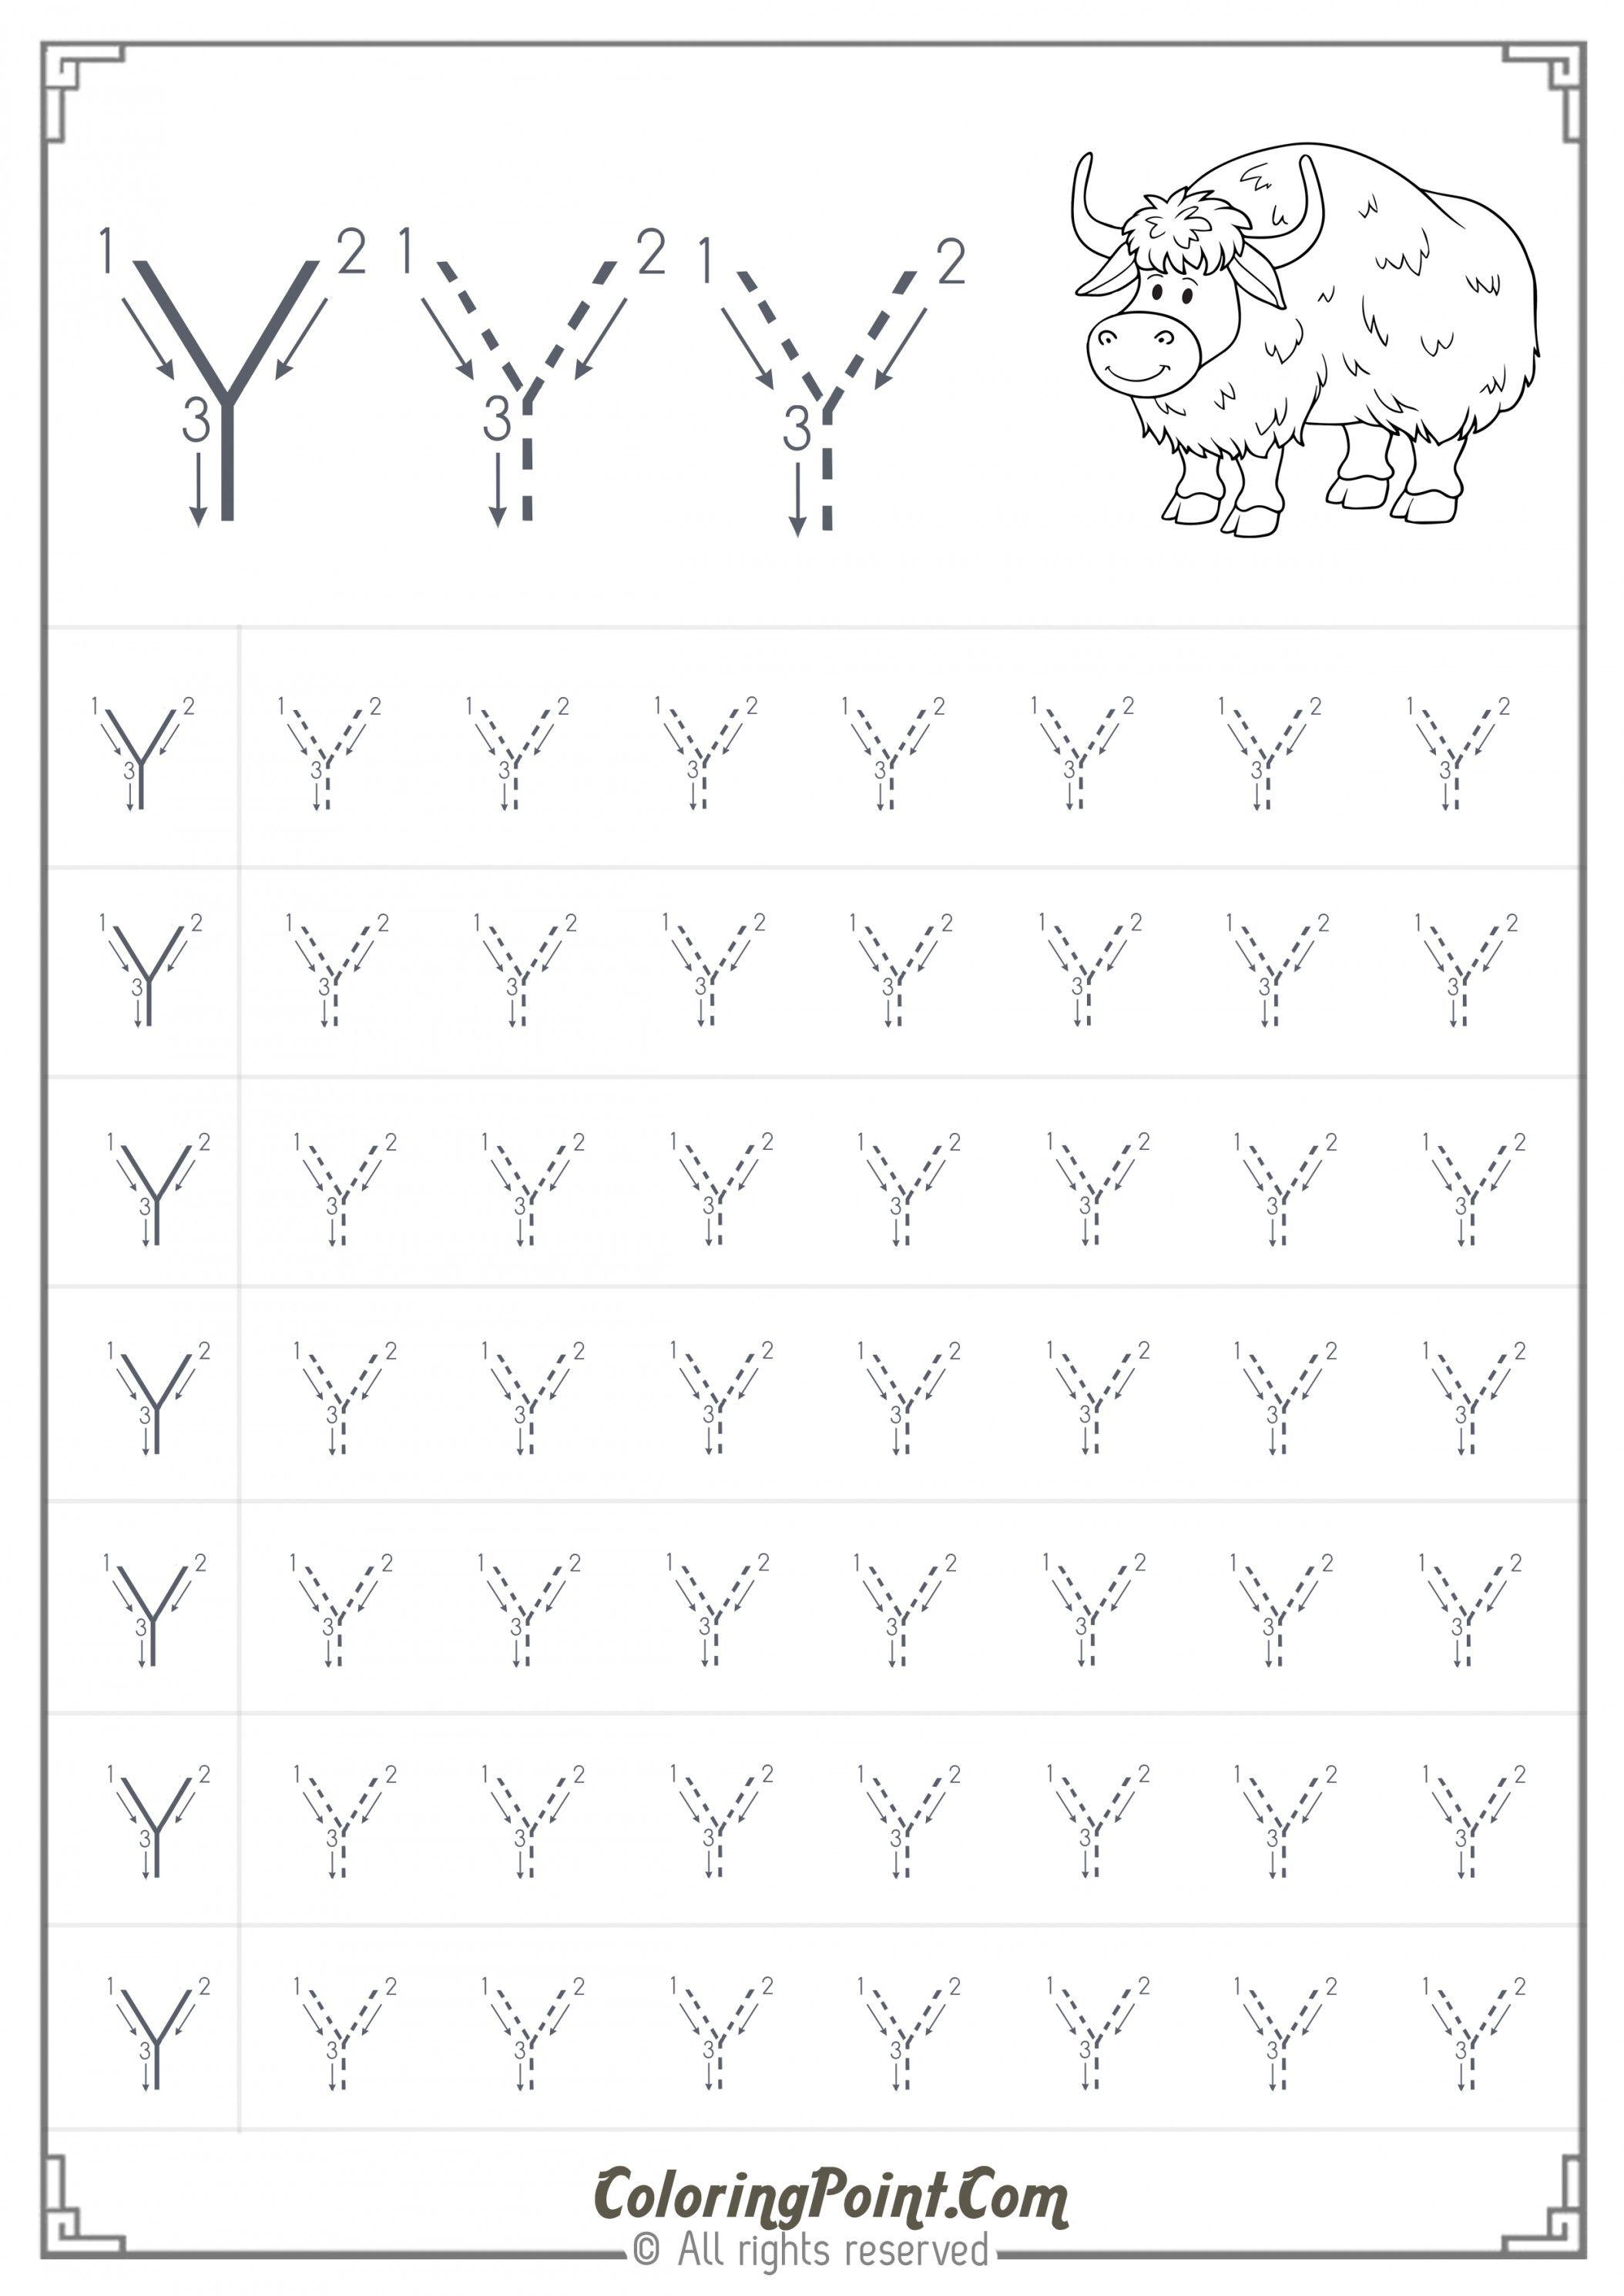 398 Worksheet Vector Images At Vectorified